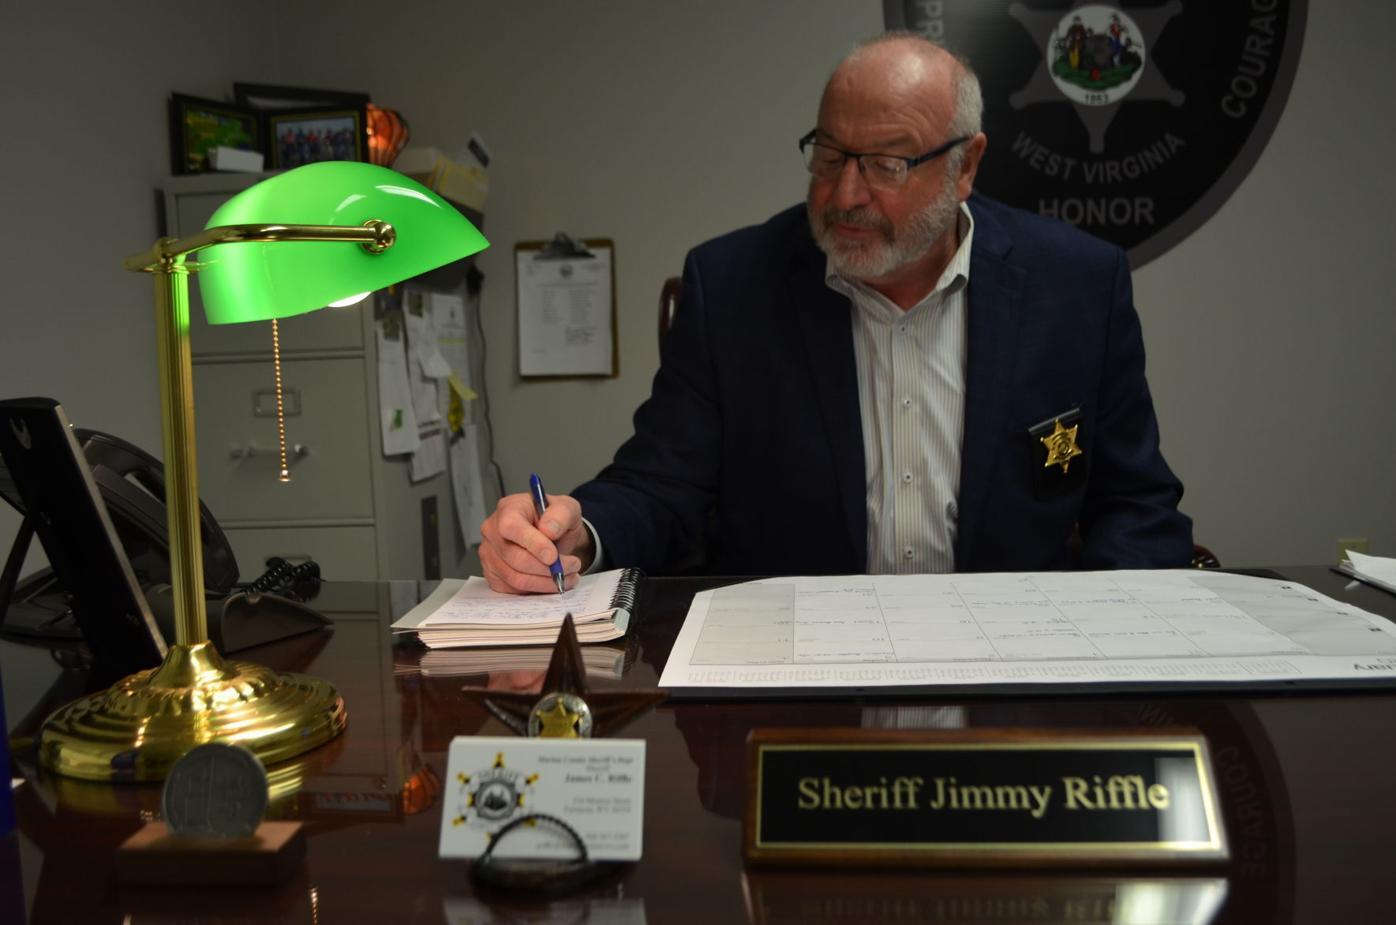 Riffle at desk